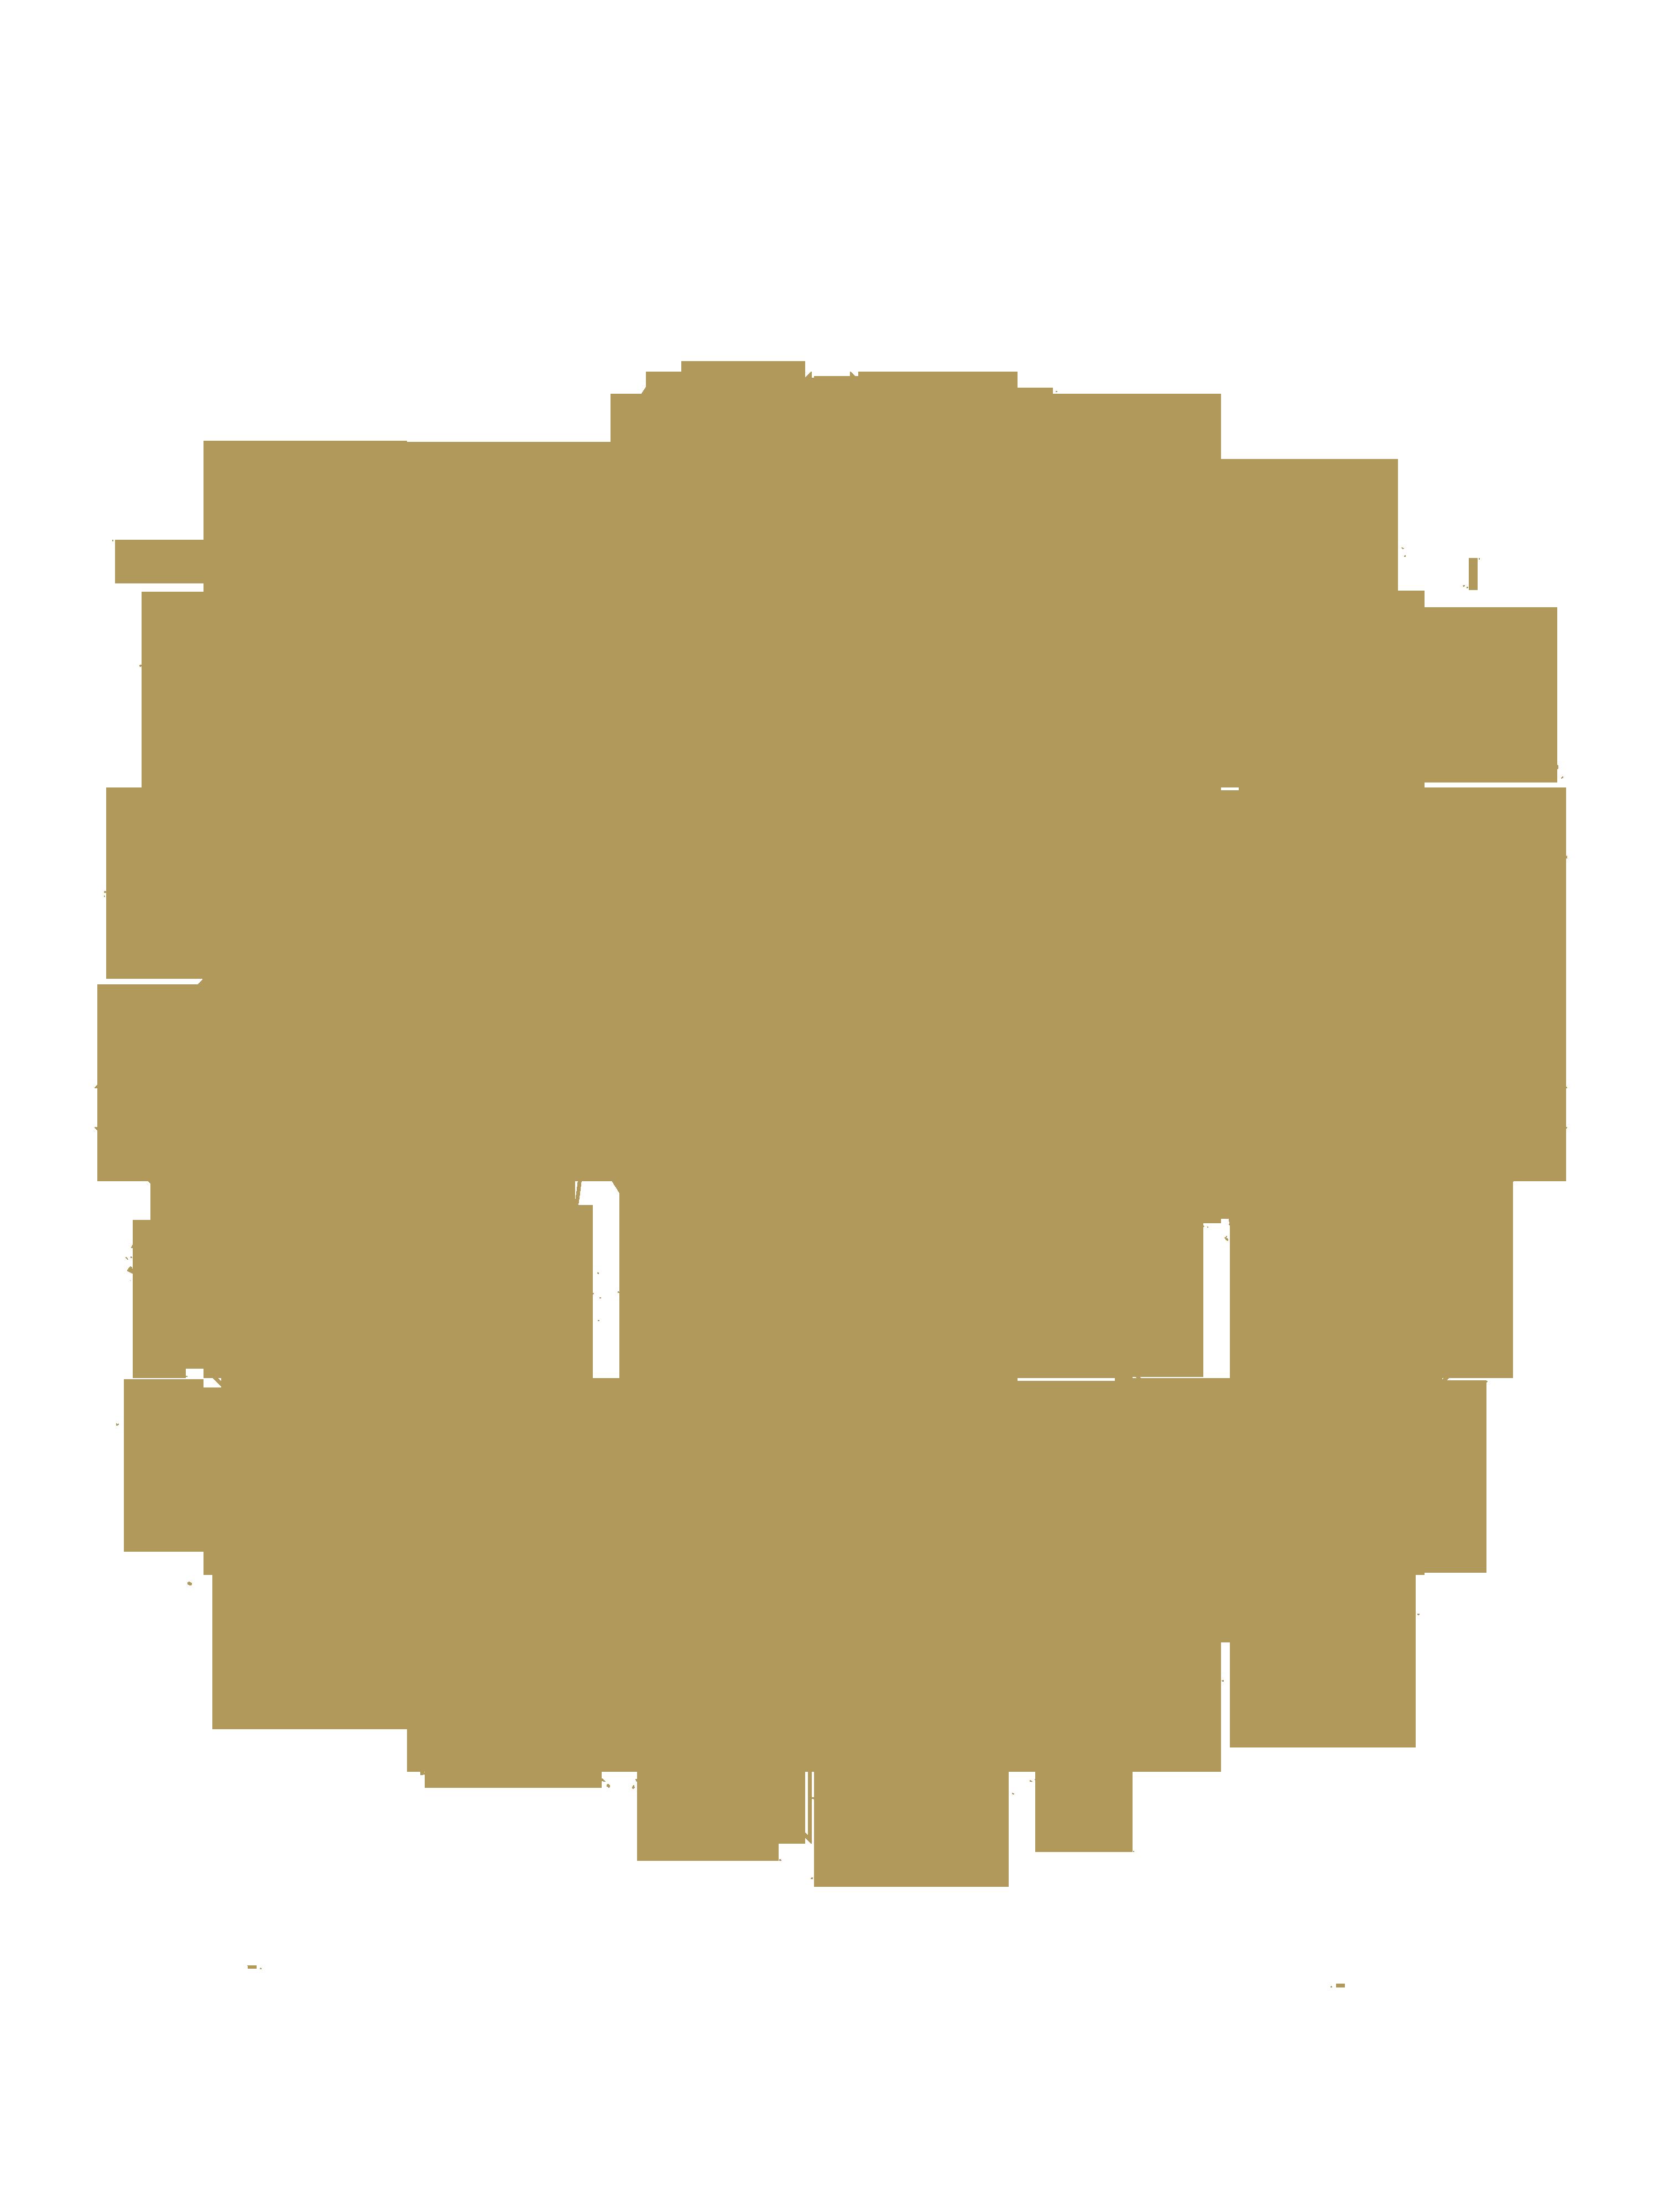 Design a striking t-shirt for a progressive metal band